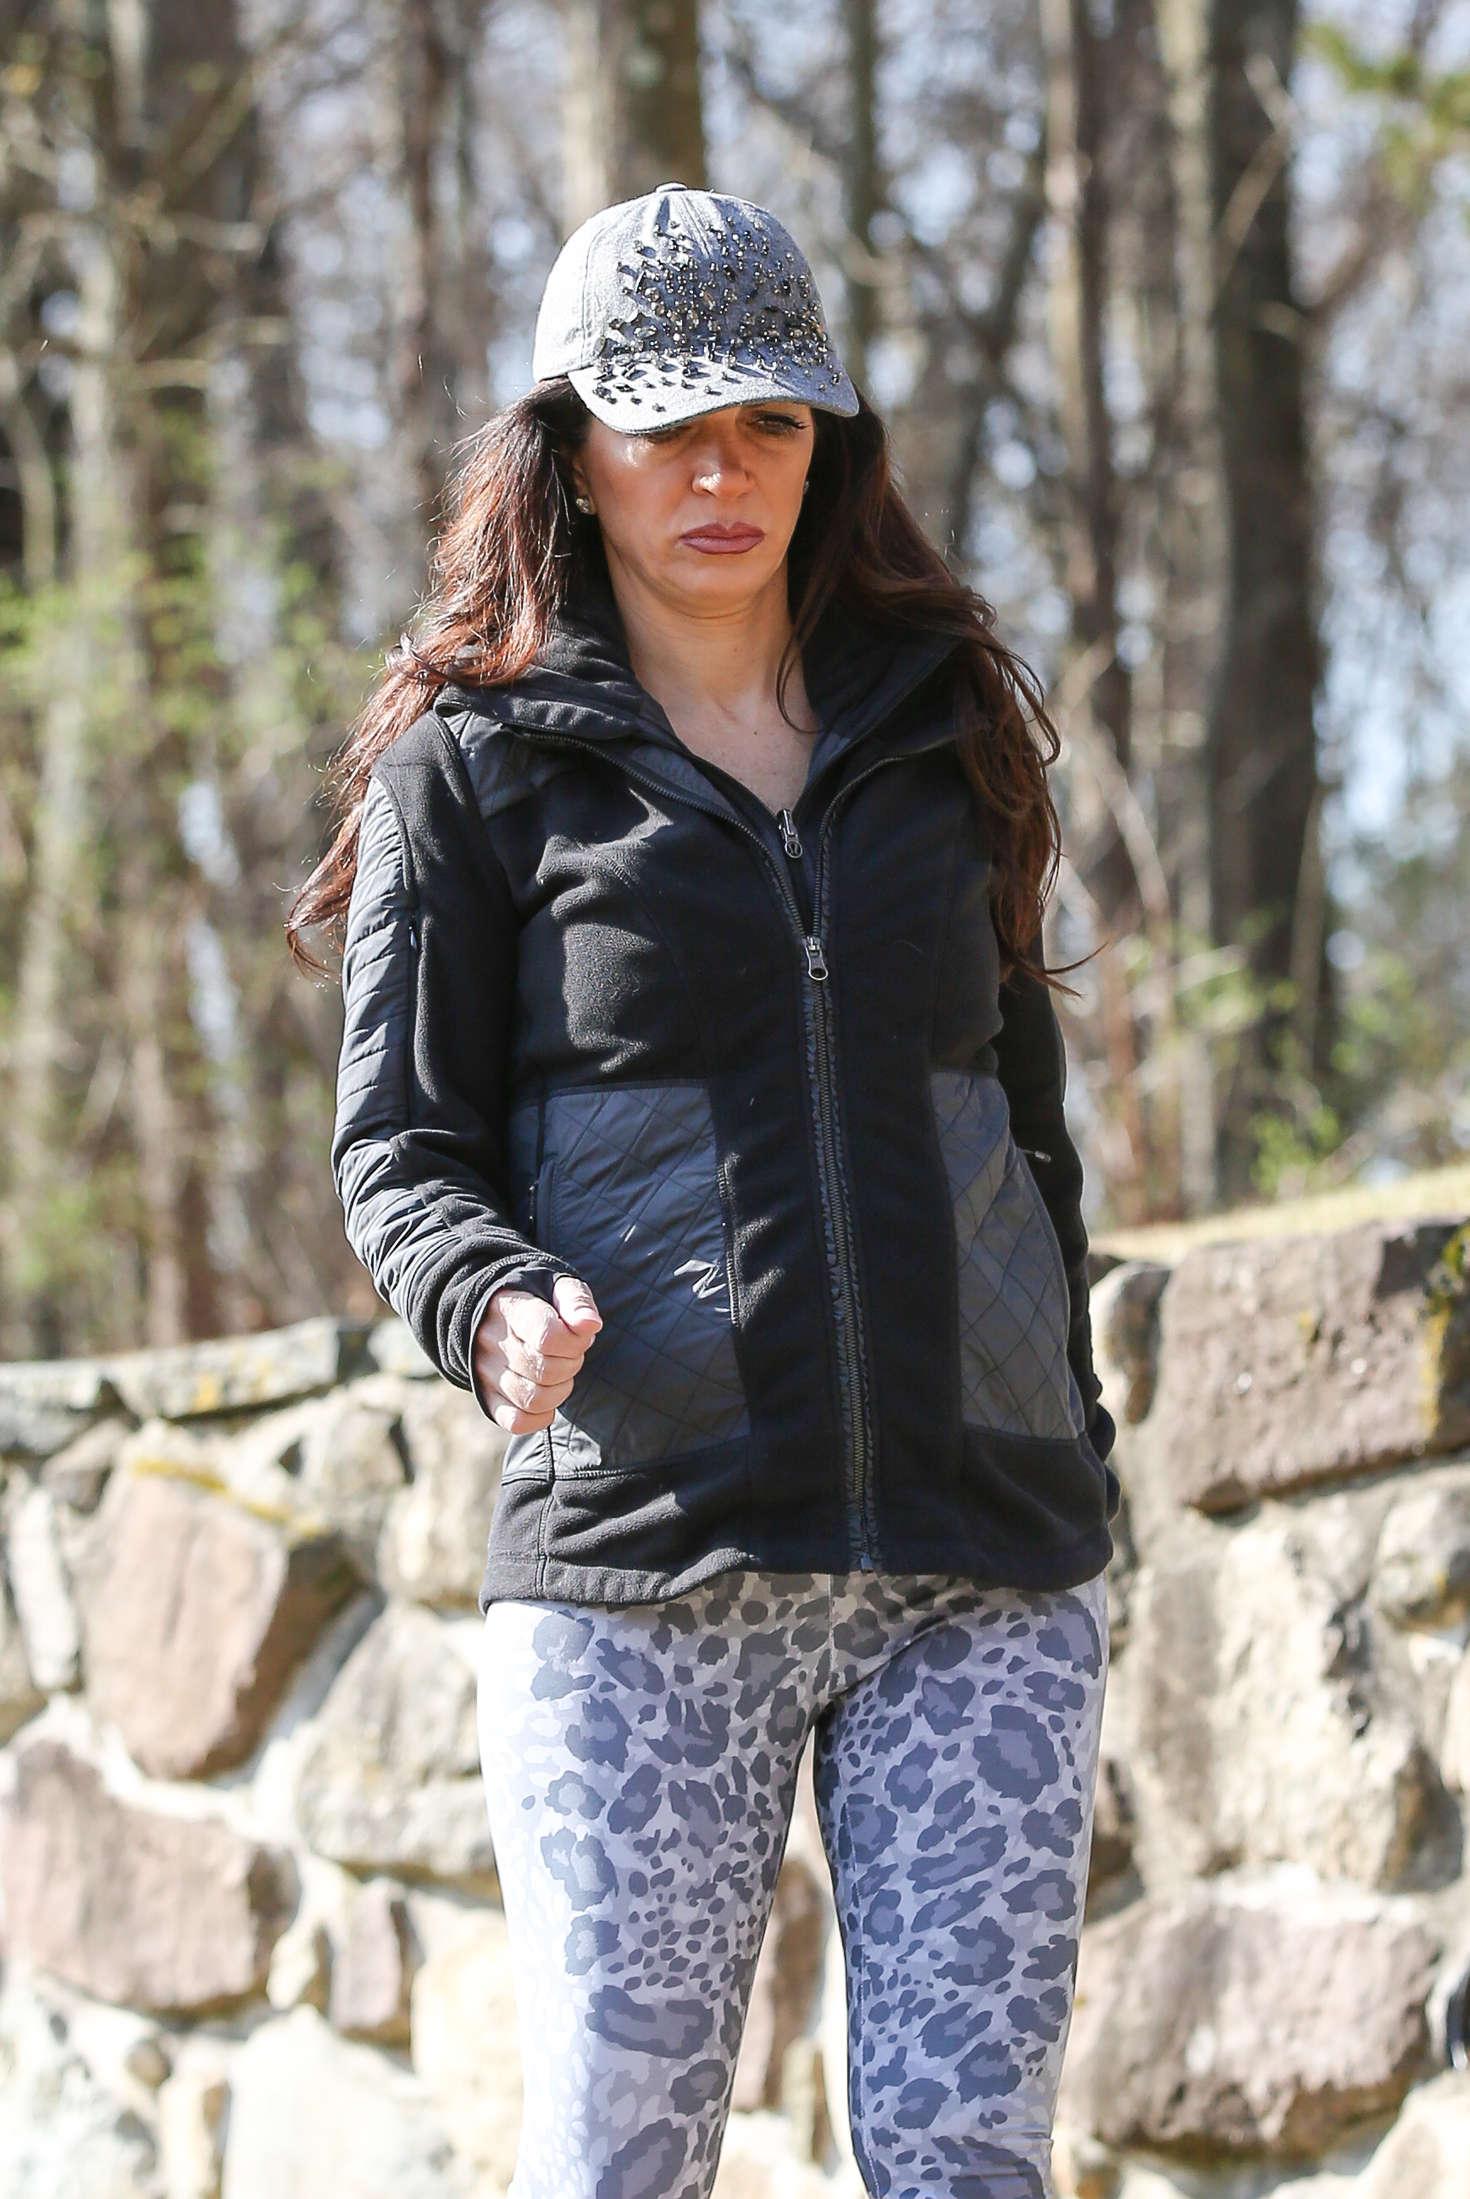 Teresa Giudice goes for a walk in the park in New York